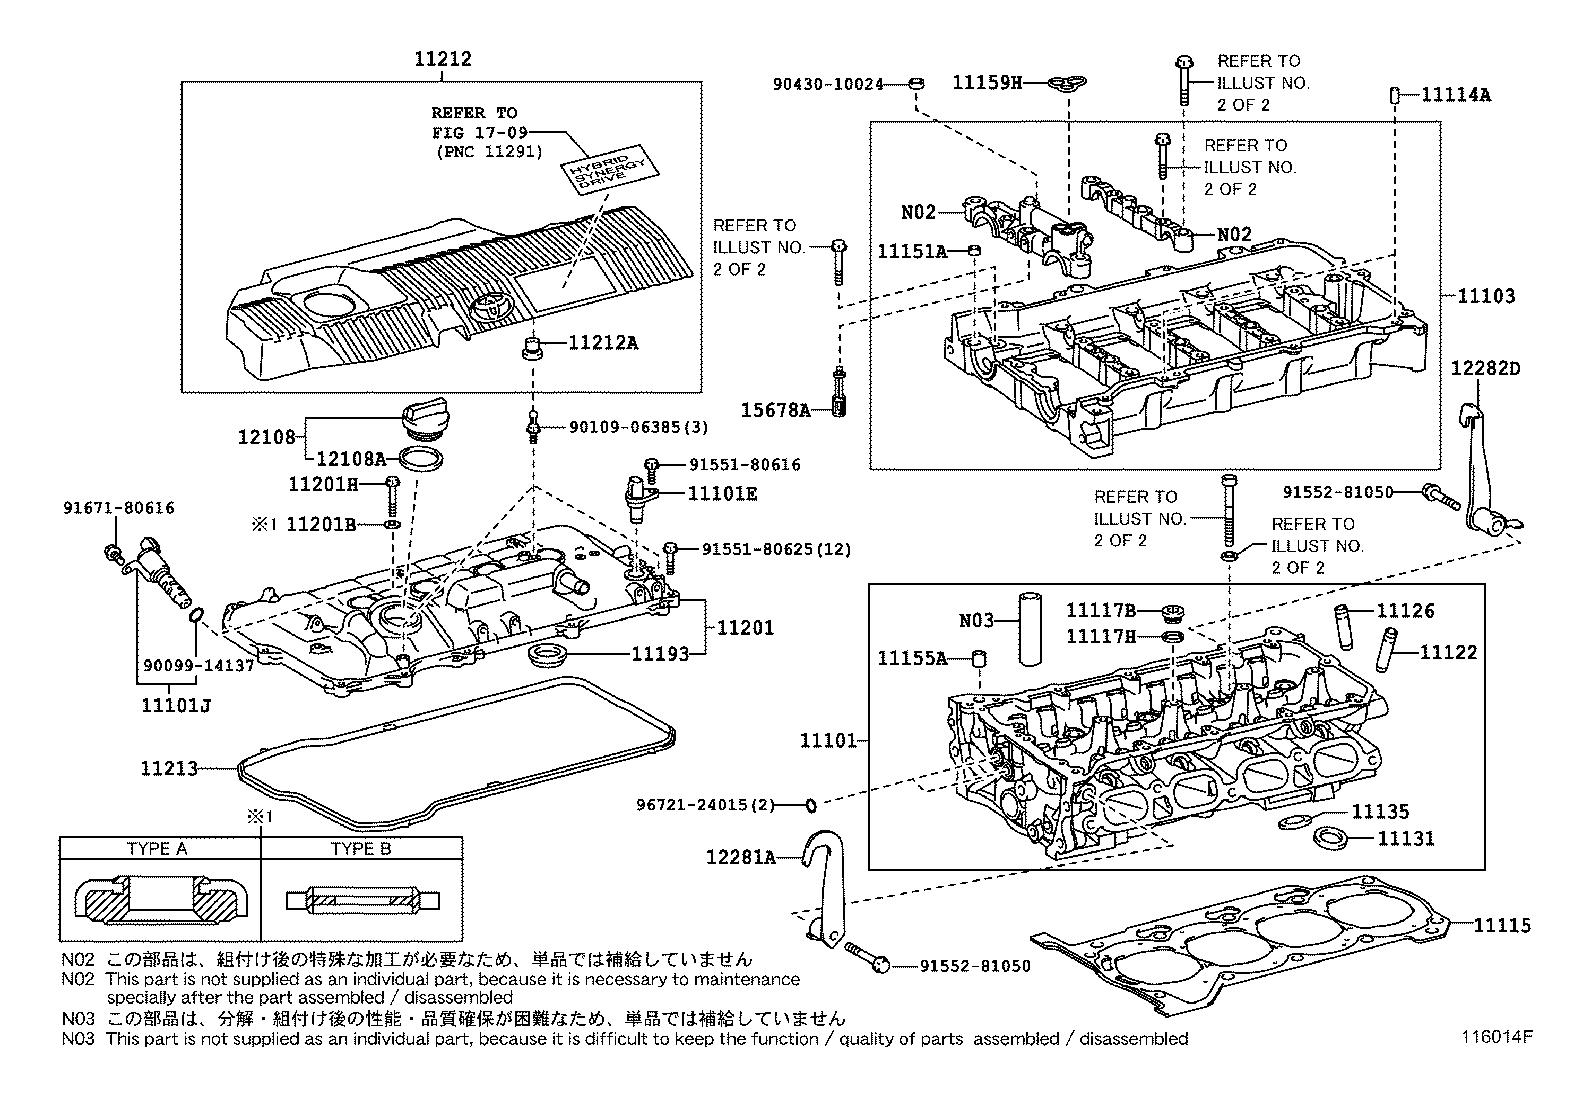 toyota priuszvw30l-ahxeba - tool-engine-fuel